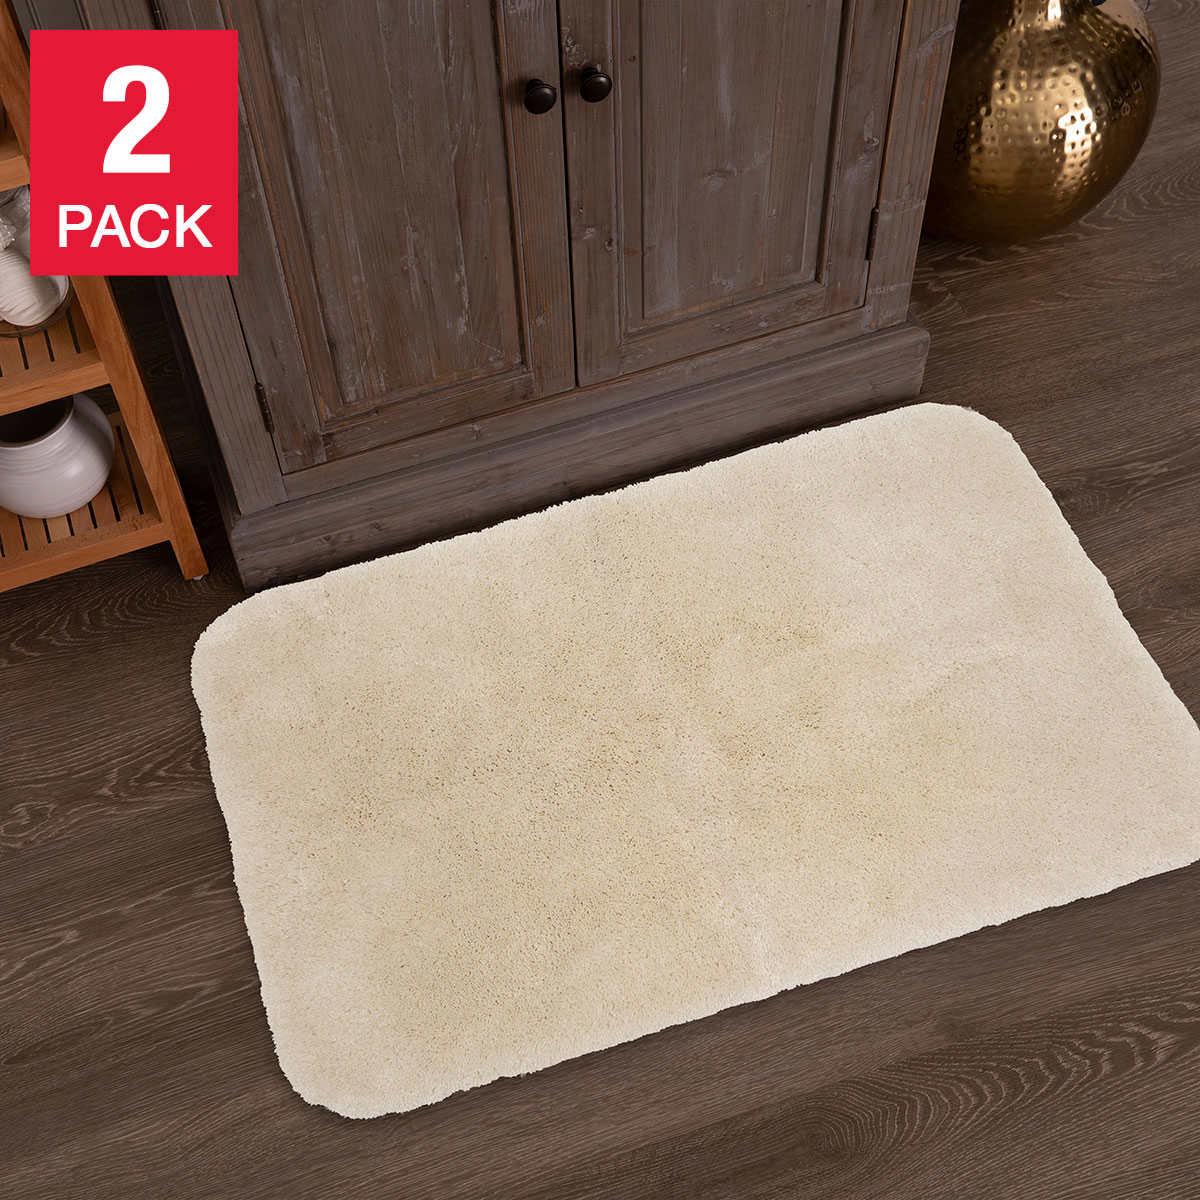 decorative play mat.htm charisma bath mat  2 pack  charisma bath mat  2 pack